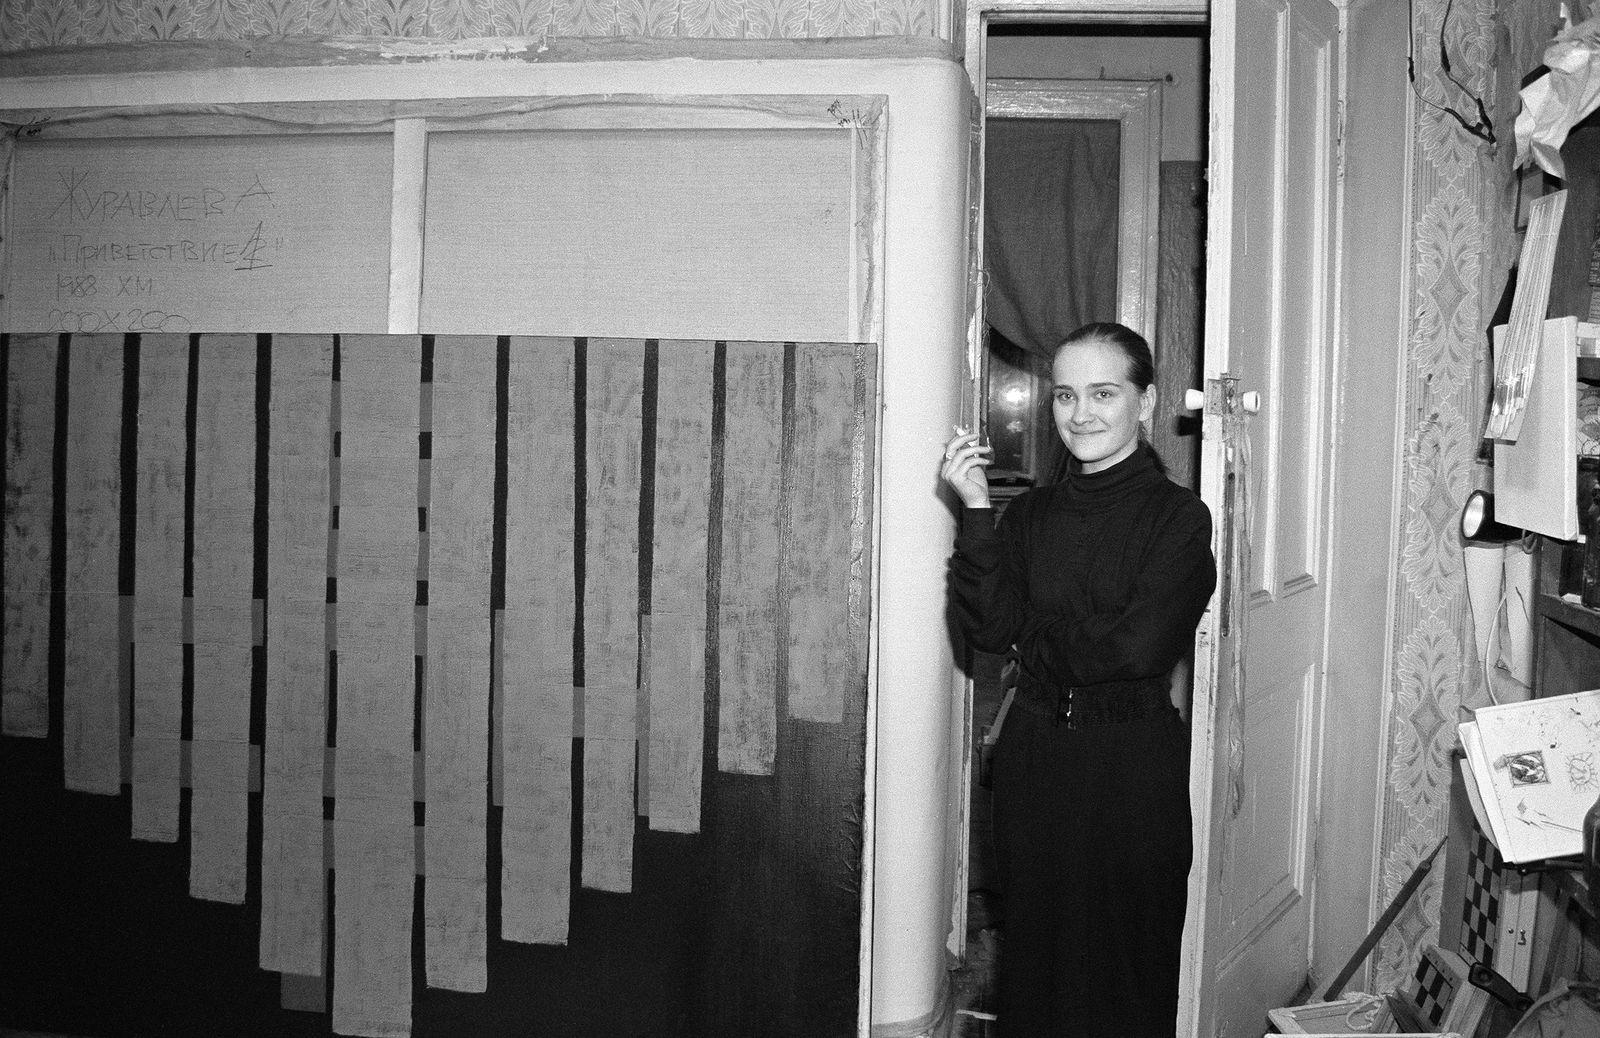 Андрей Безукладников. Совриск. Мария Серебрякова. 1988